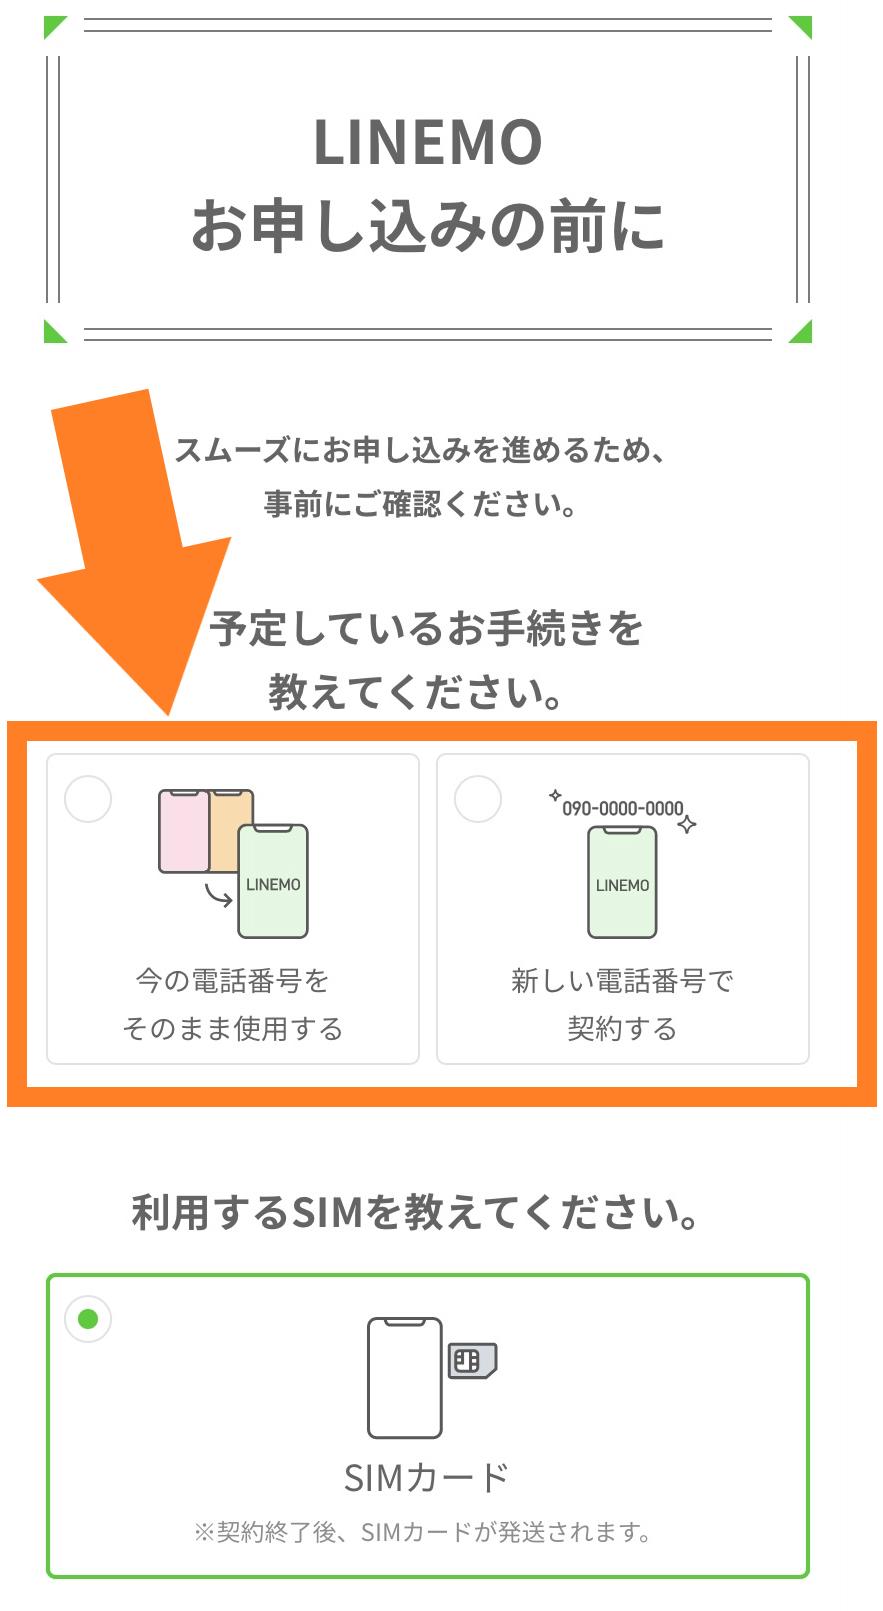 LINEMO_iPhone_LINEMO申し込み手続き2